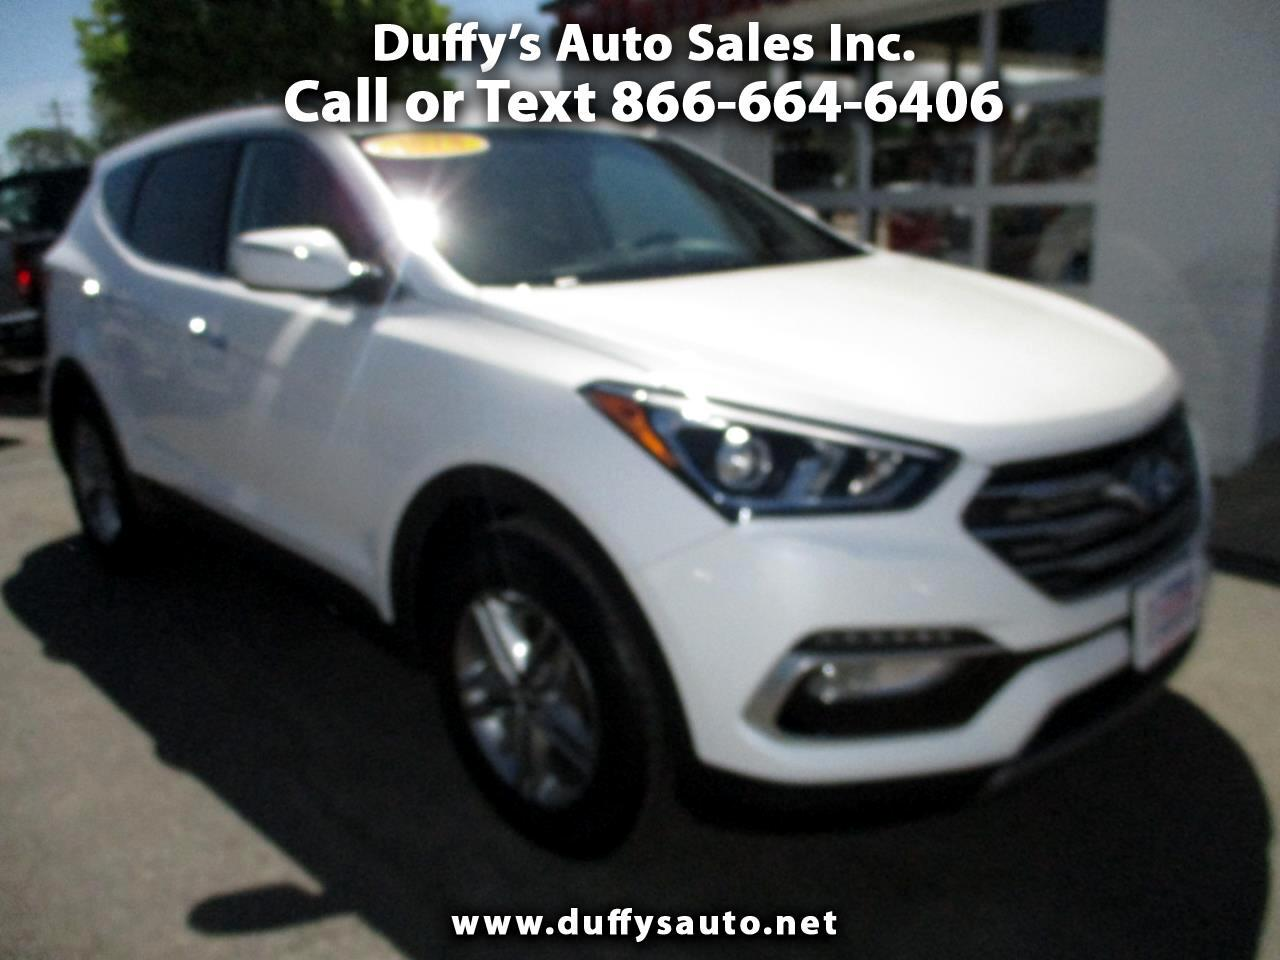 2018 Hyundai Santa Fe Sport 2.4L Auto